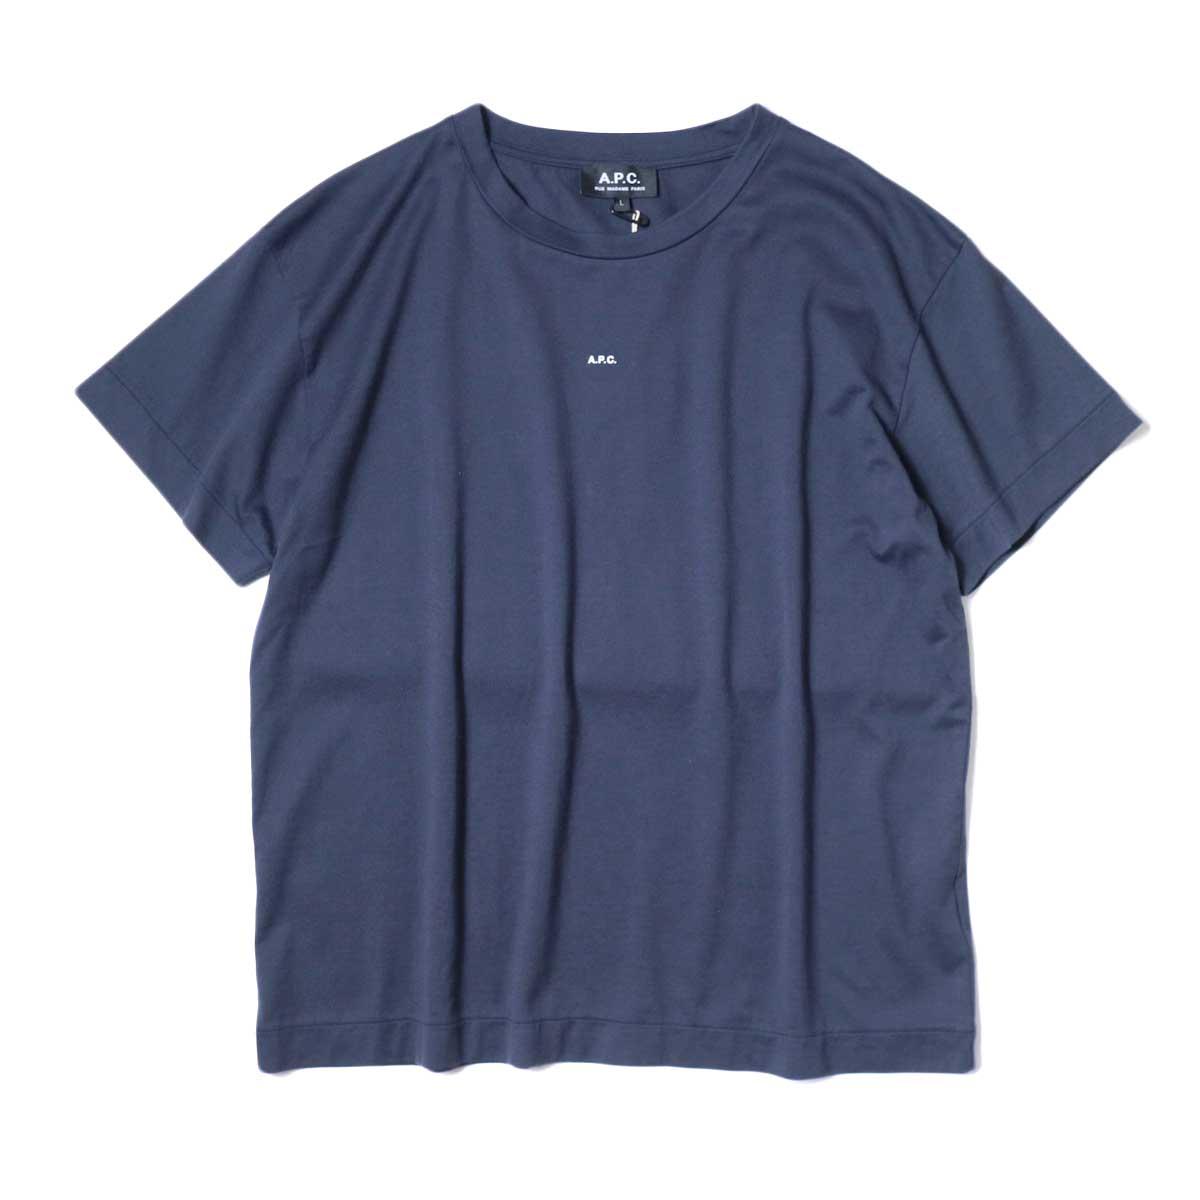 A.P.C. / Jade Tシャツ (Navy) 正面